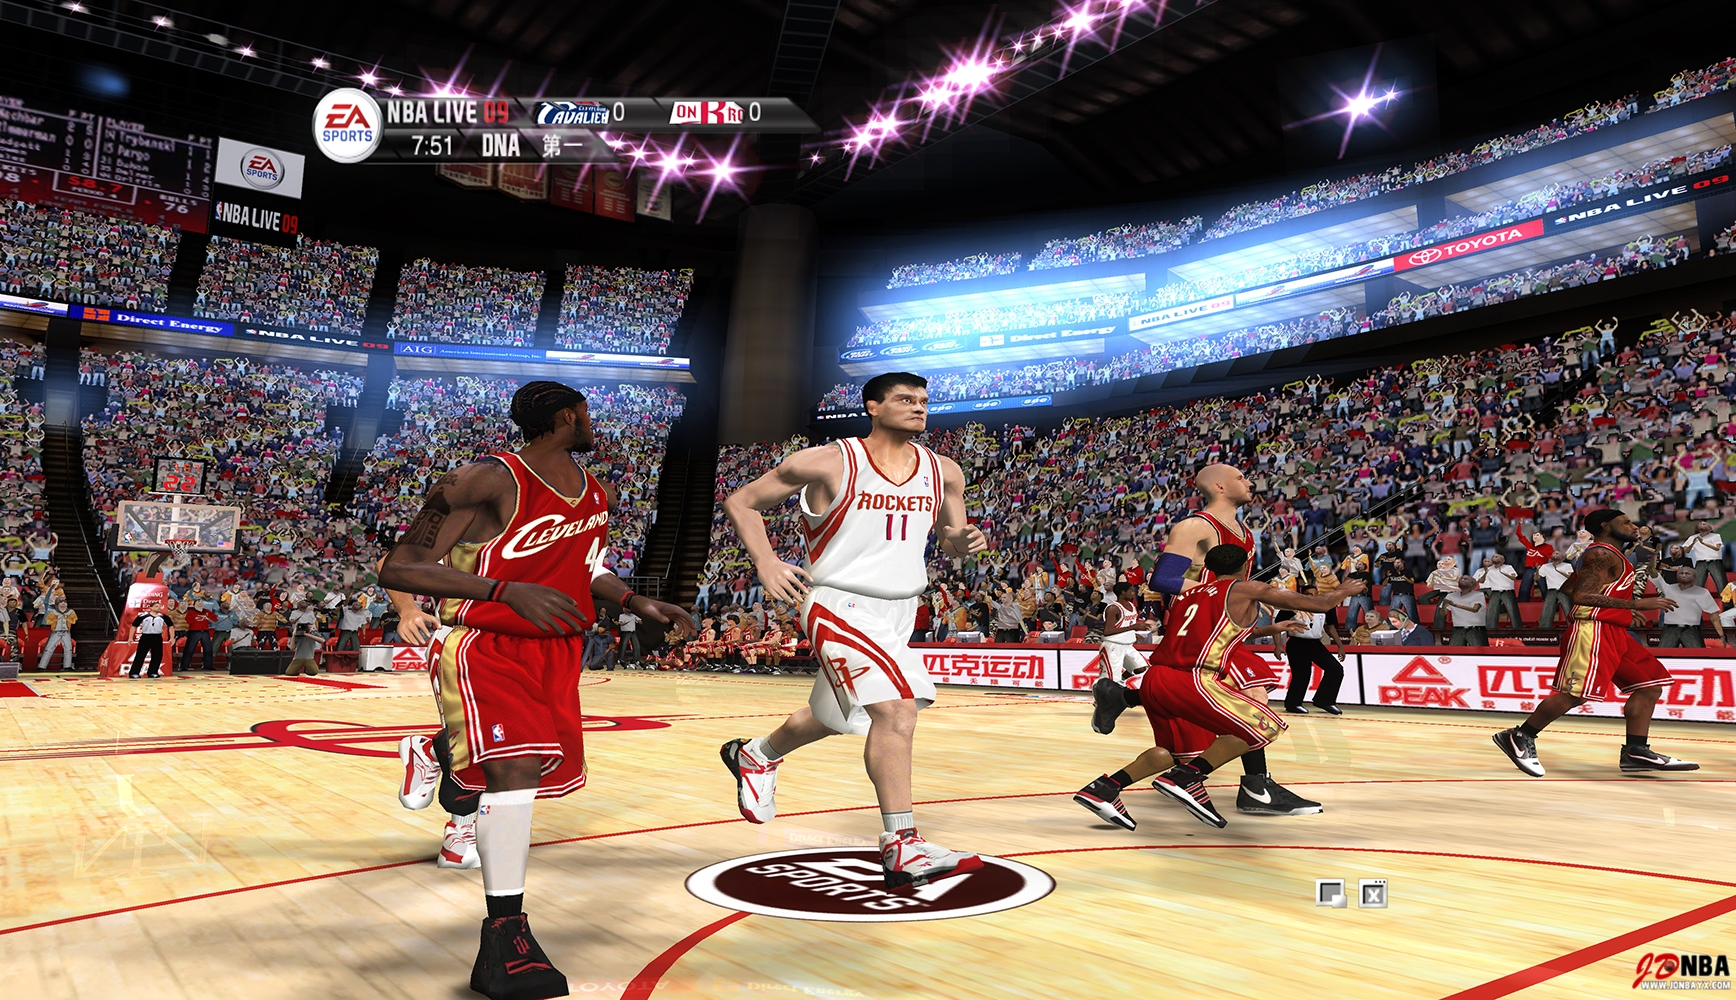 NBA LIVE 09【4K】-2021-08-28-00-44-26-743副本.jpg